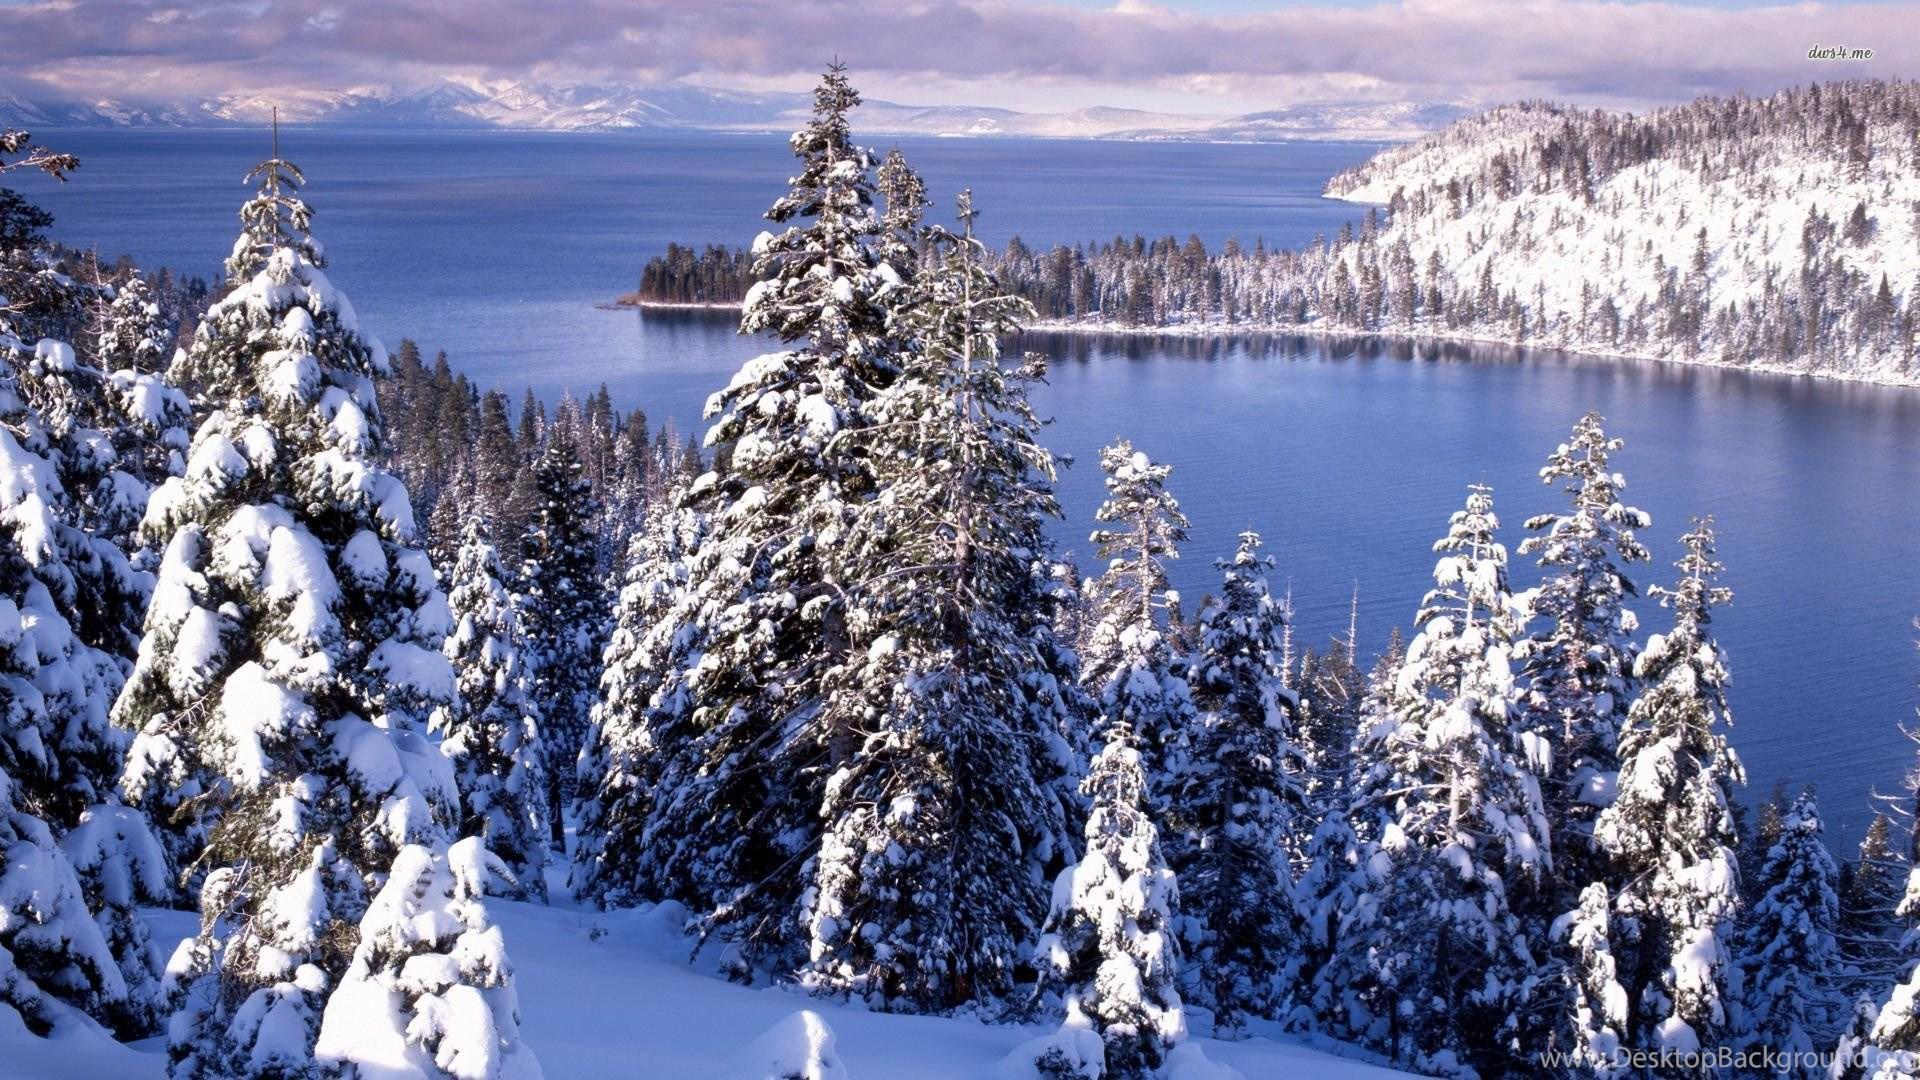 Lake Tahoe Reno Nevada Nature 1920x1080 Hd Wallpapers And Free Desktop Background